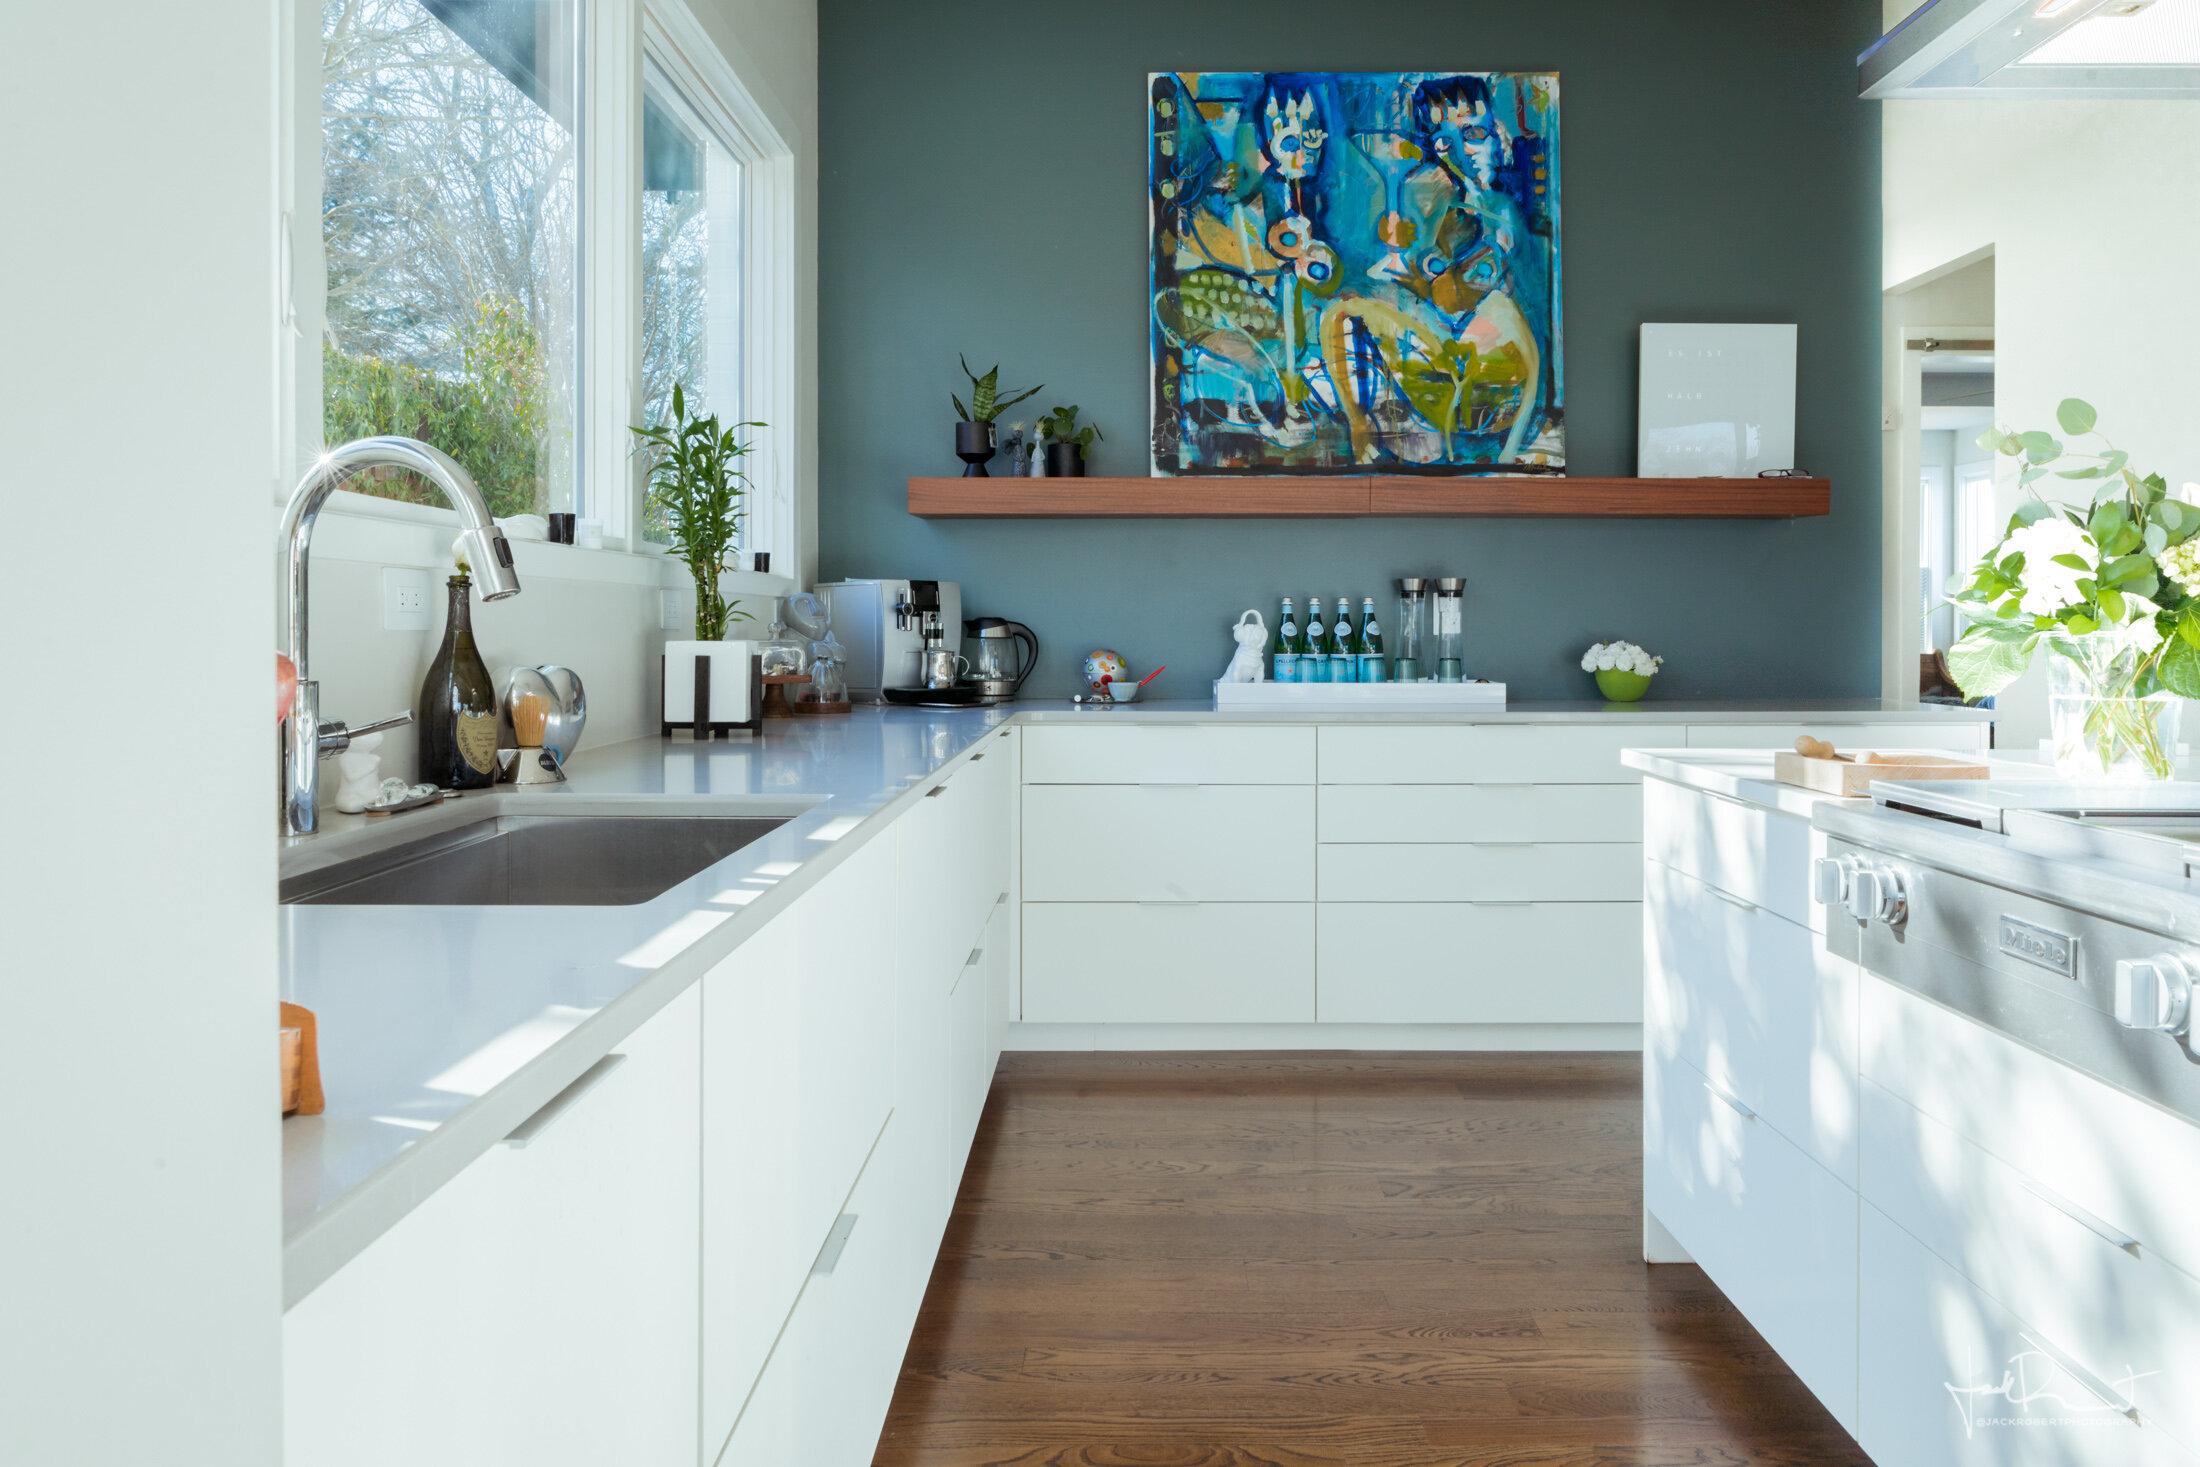 2020-02-28 Forest Kitchen Design - Jack Robert Photography (9 of 52).jpg